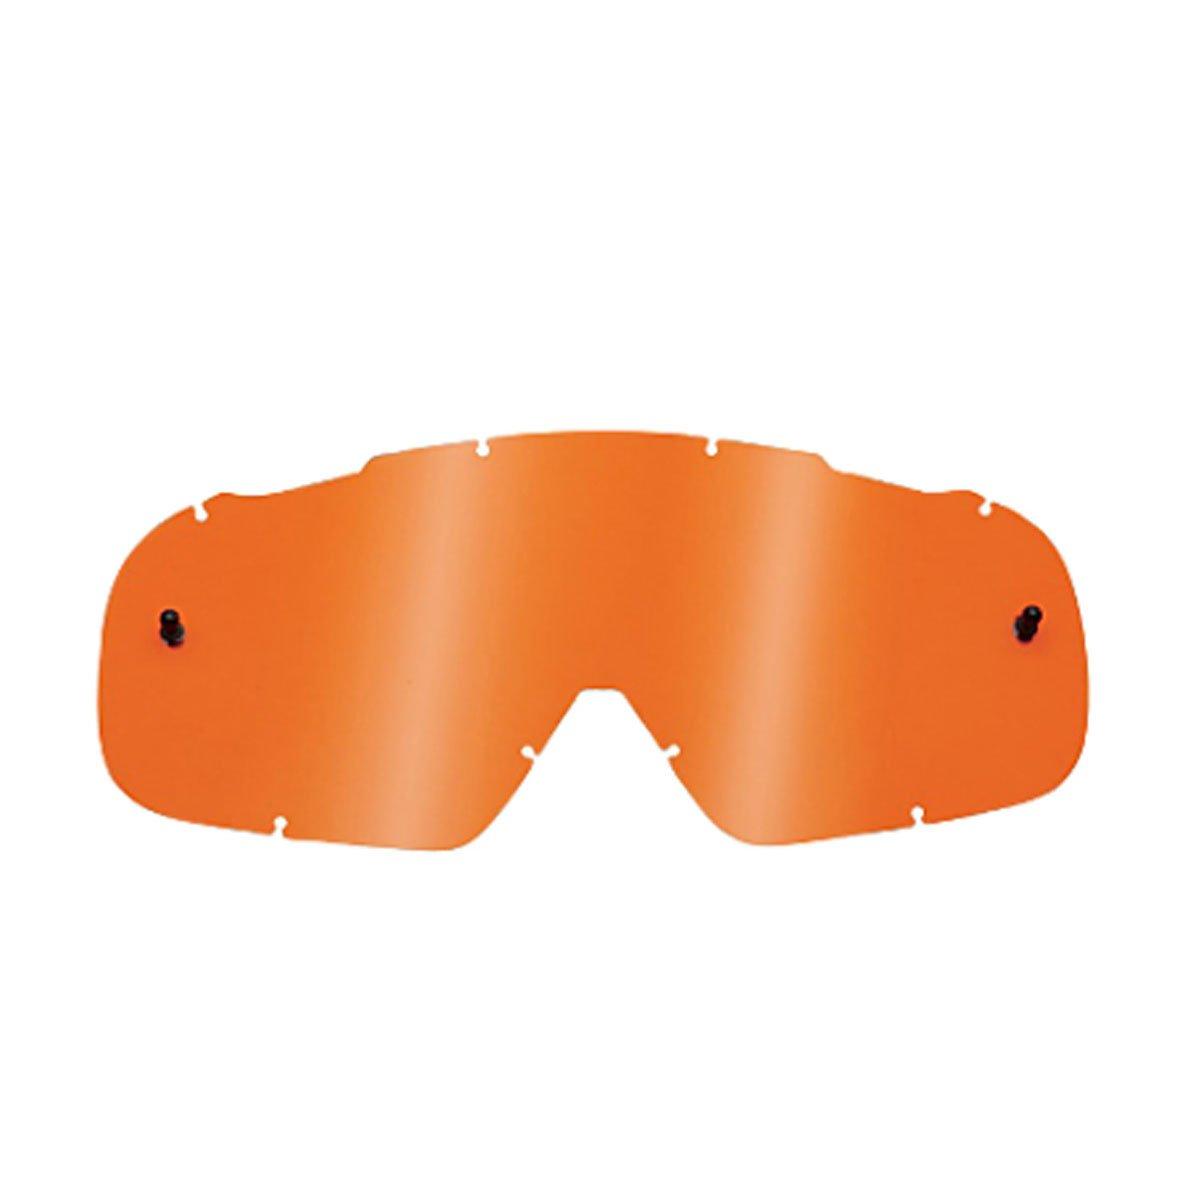 Fox Youth Airspc Ersatzglas klar